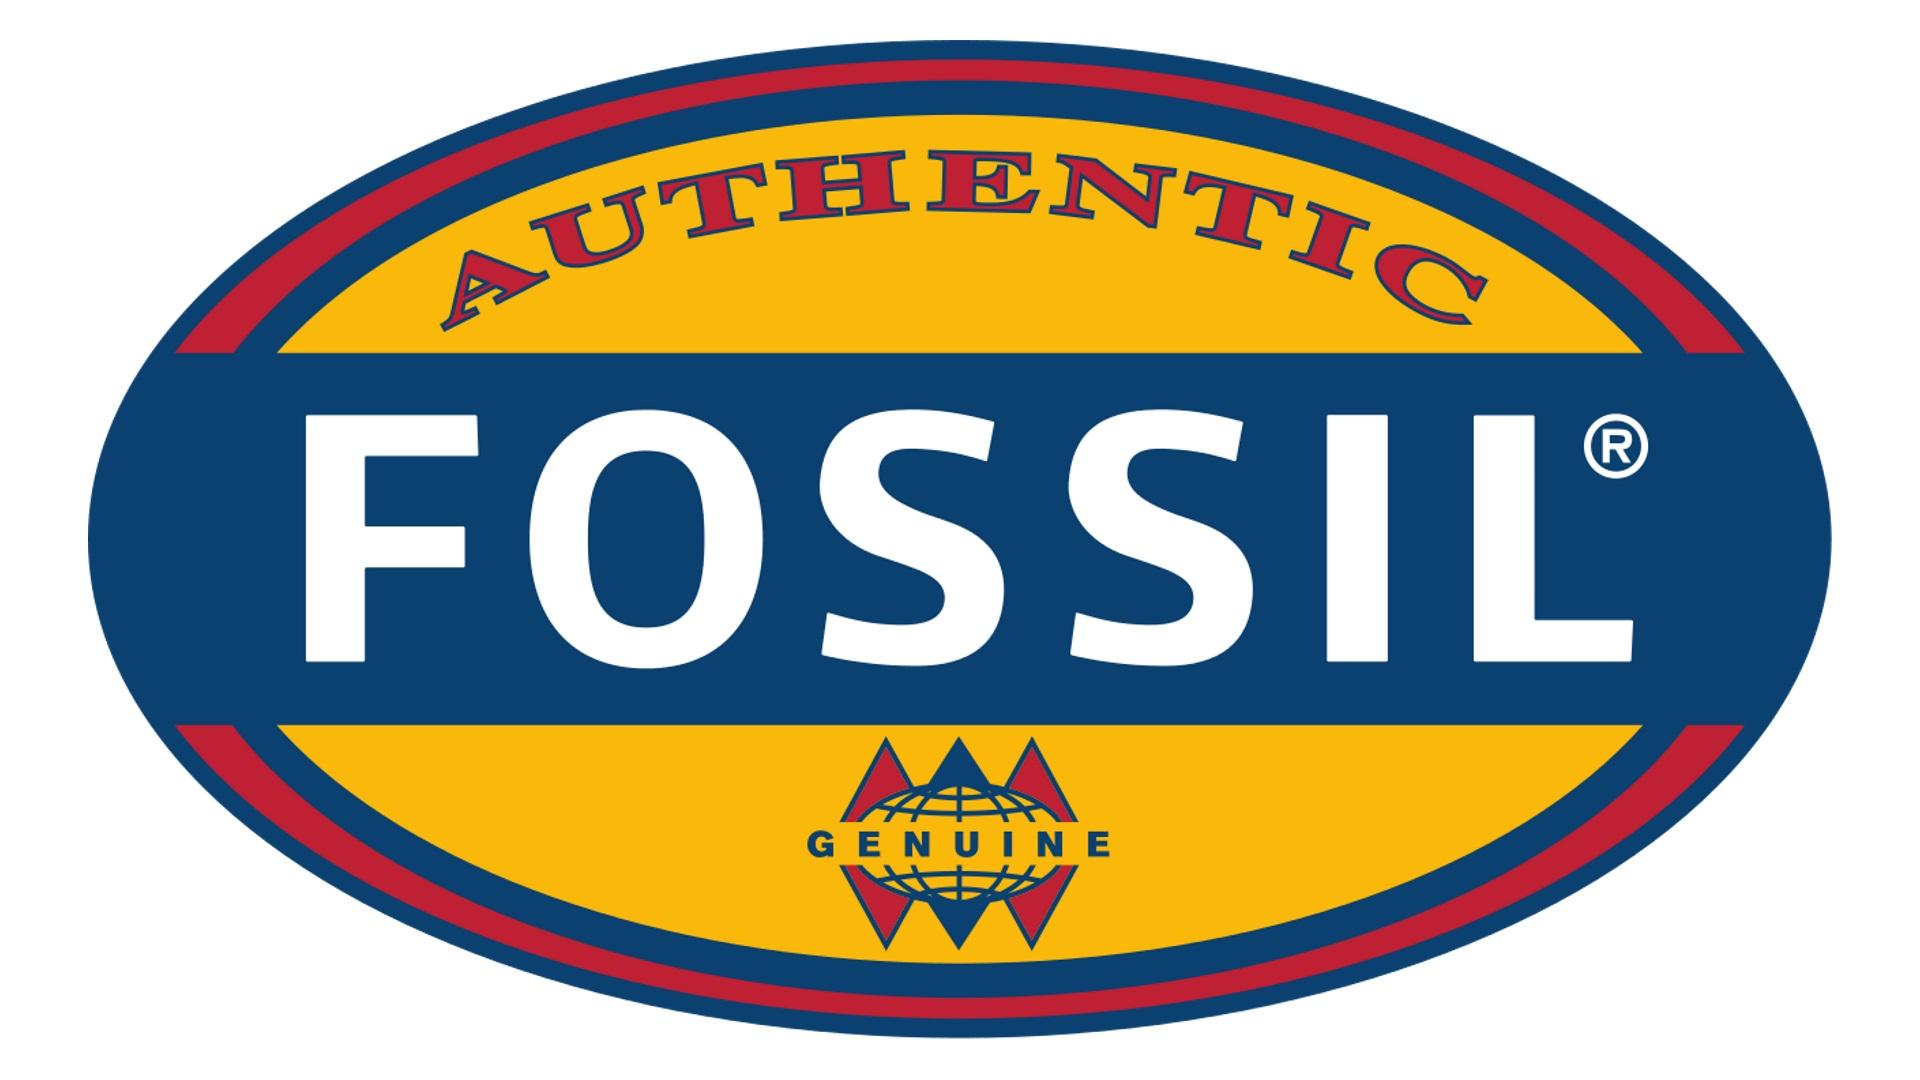 Fossil Group、グループ傘下のFossilとMisfitのほかにDIESEL/Emporio Armani/Michael KorsブランドのAndroid Wearを2017年夏以降に順次投入へ